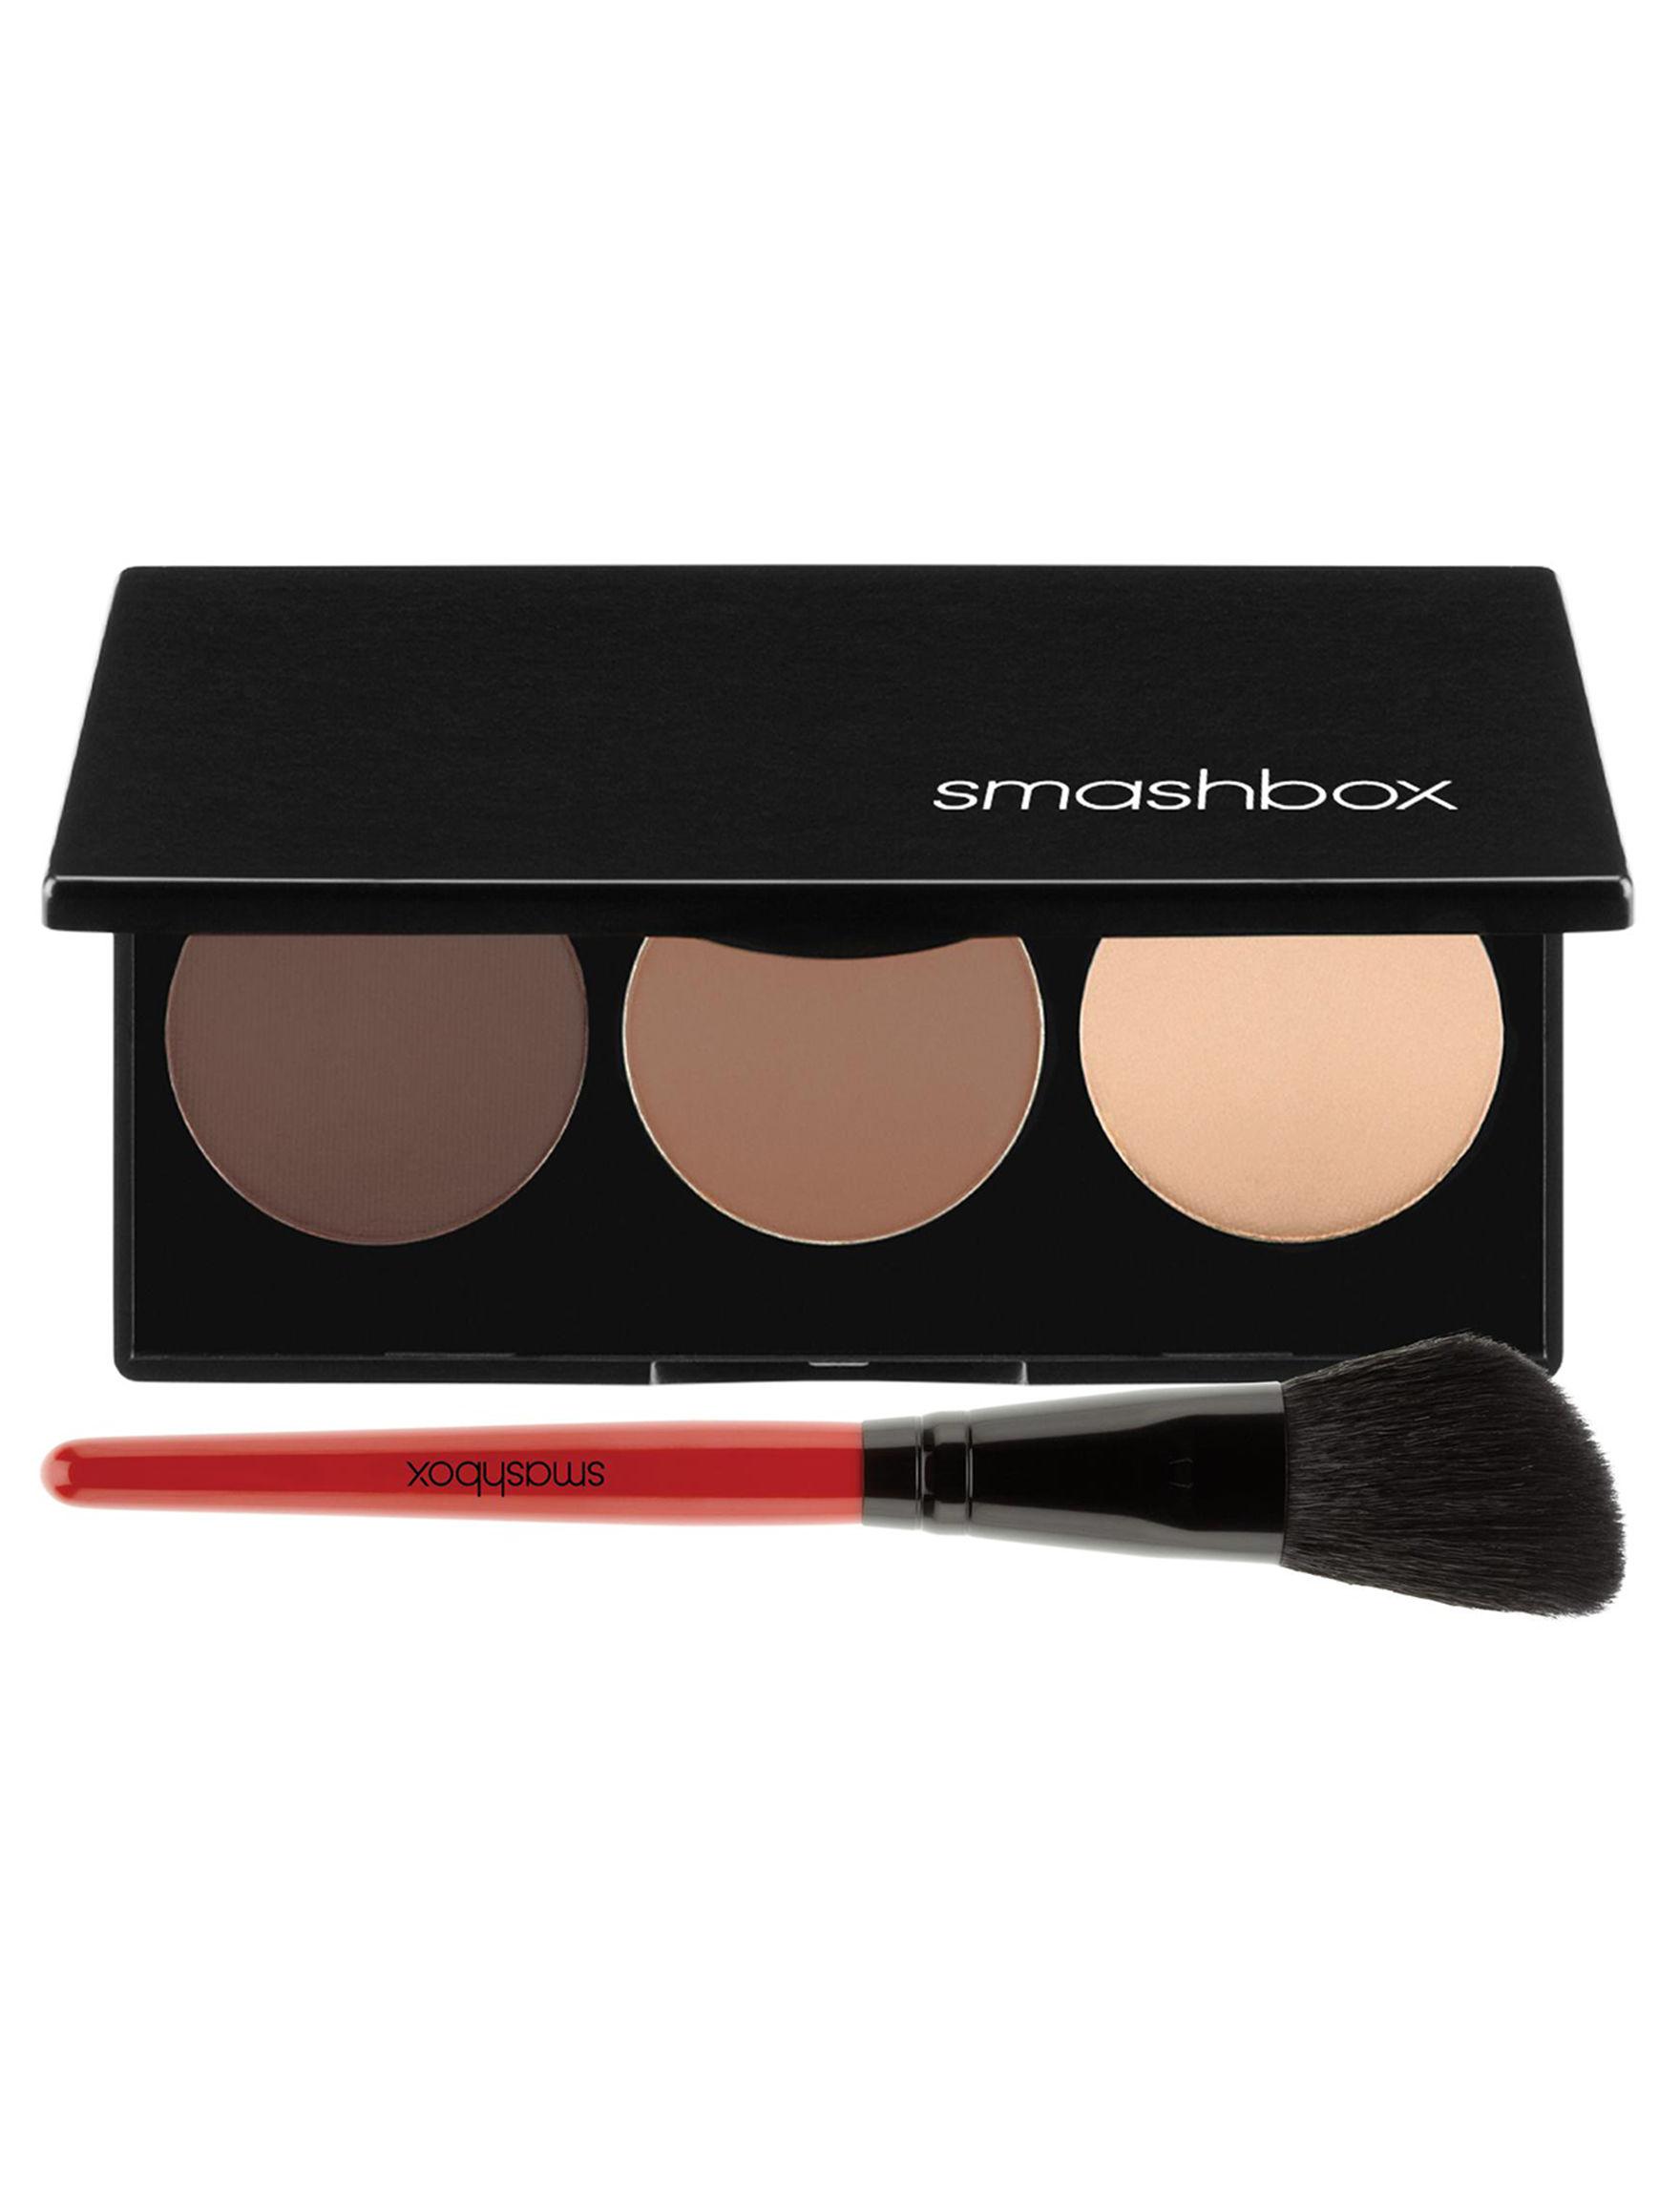 Smashbox Light/Medium Makeup Kits & Sets